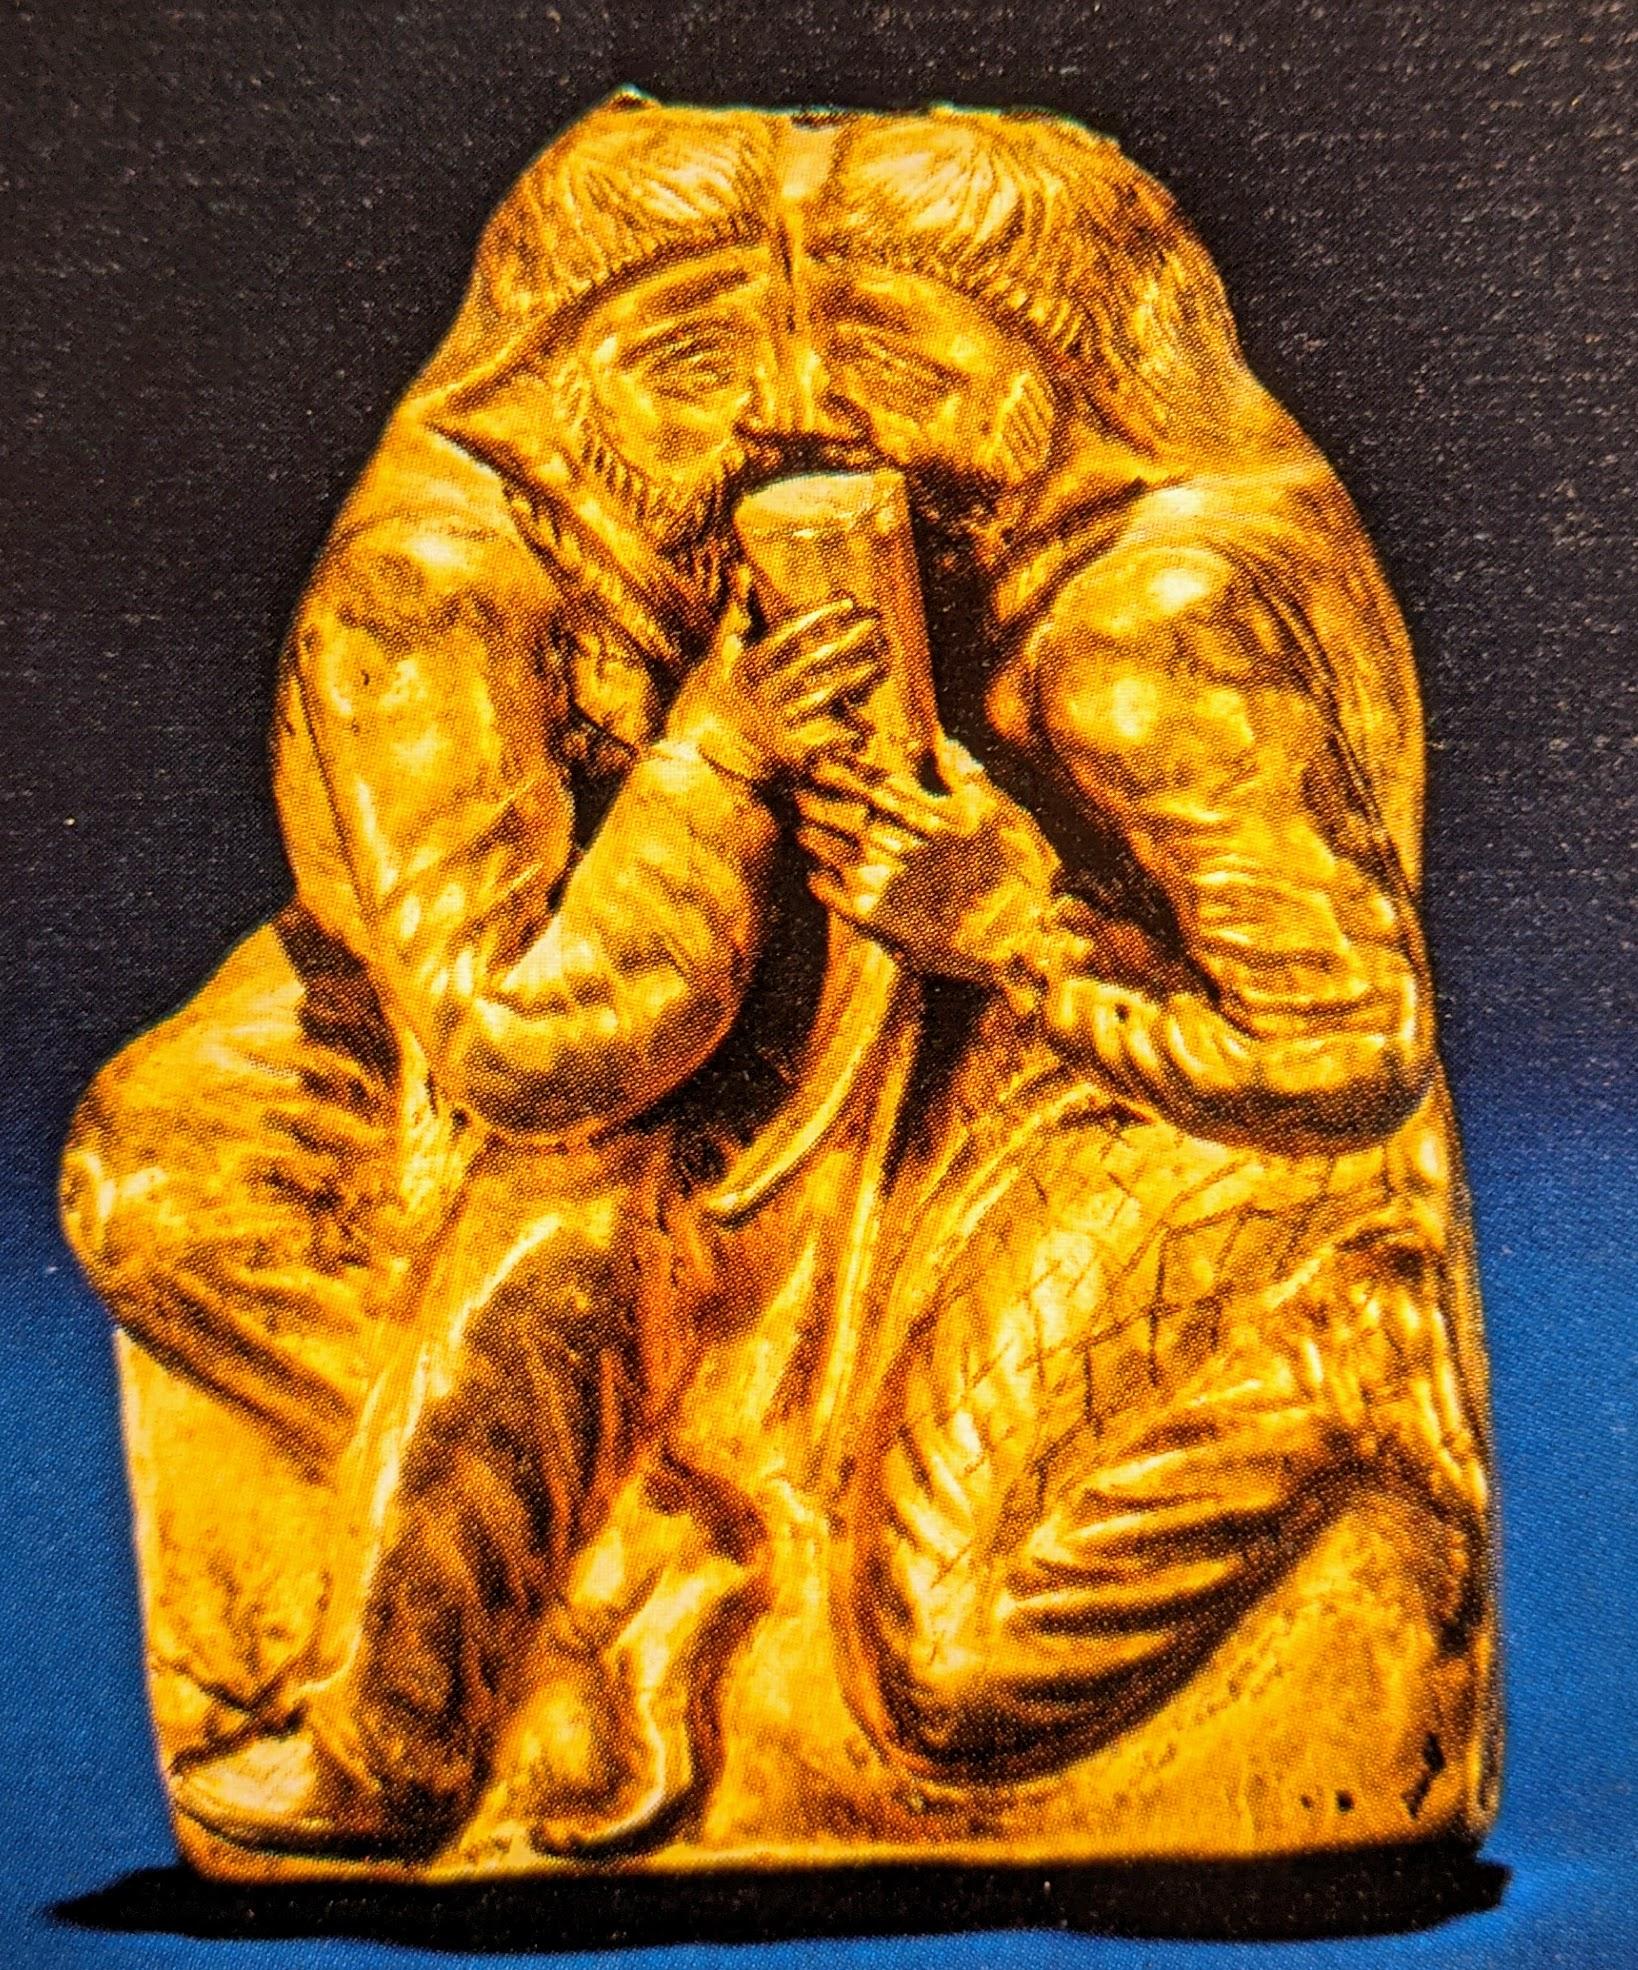 Drinking buddies gold applique plaque